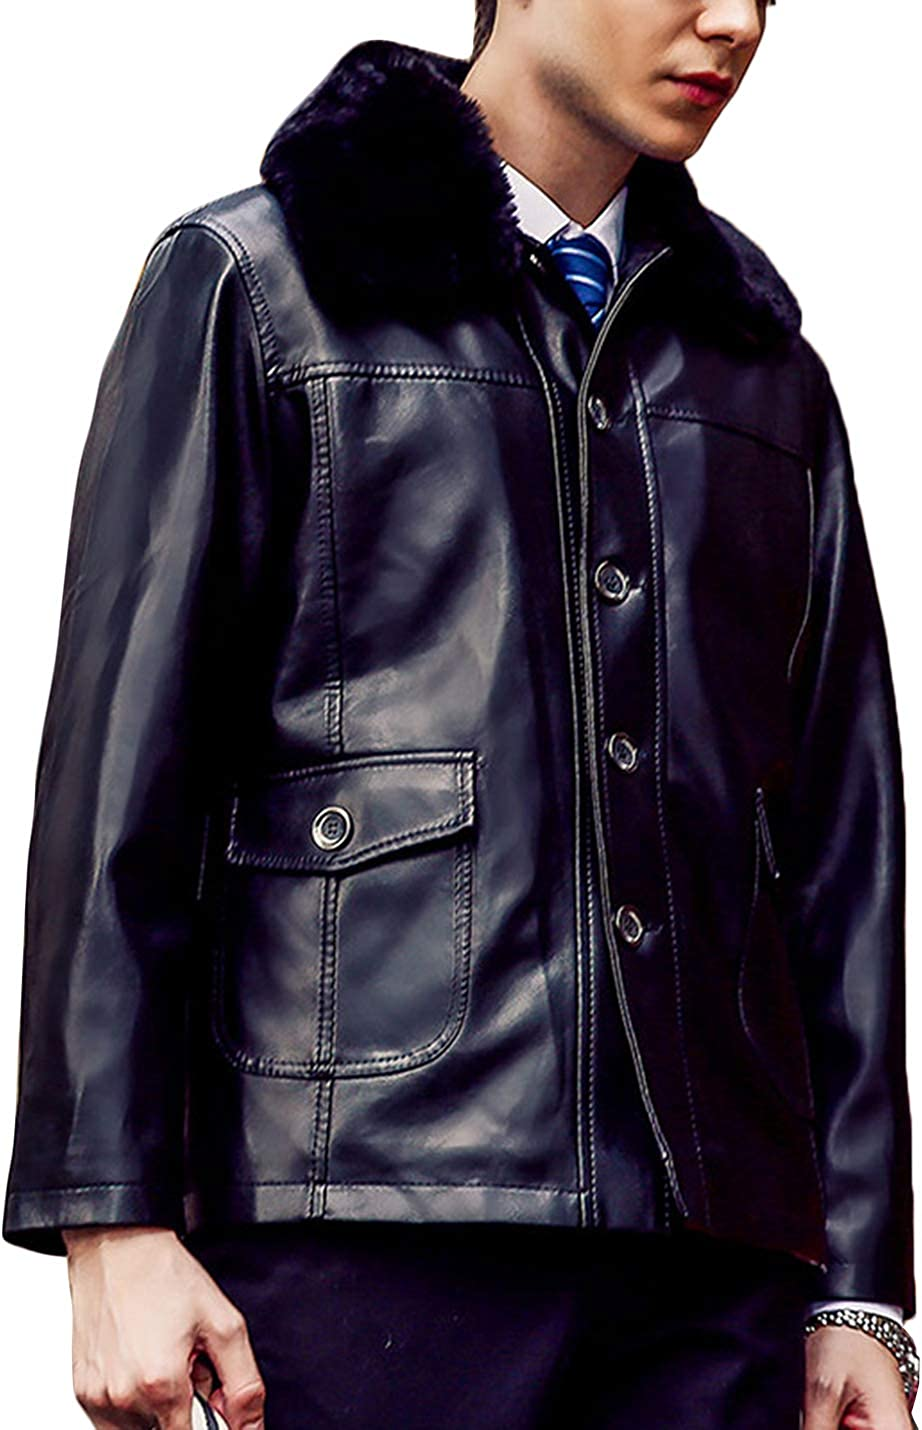 Yeokou Men's Business Casual Lapel Collar Fleece Lined Pu Faux Leather Jackets